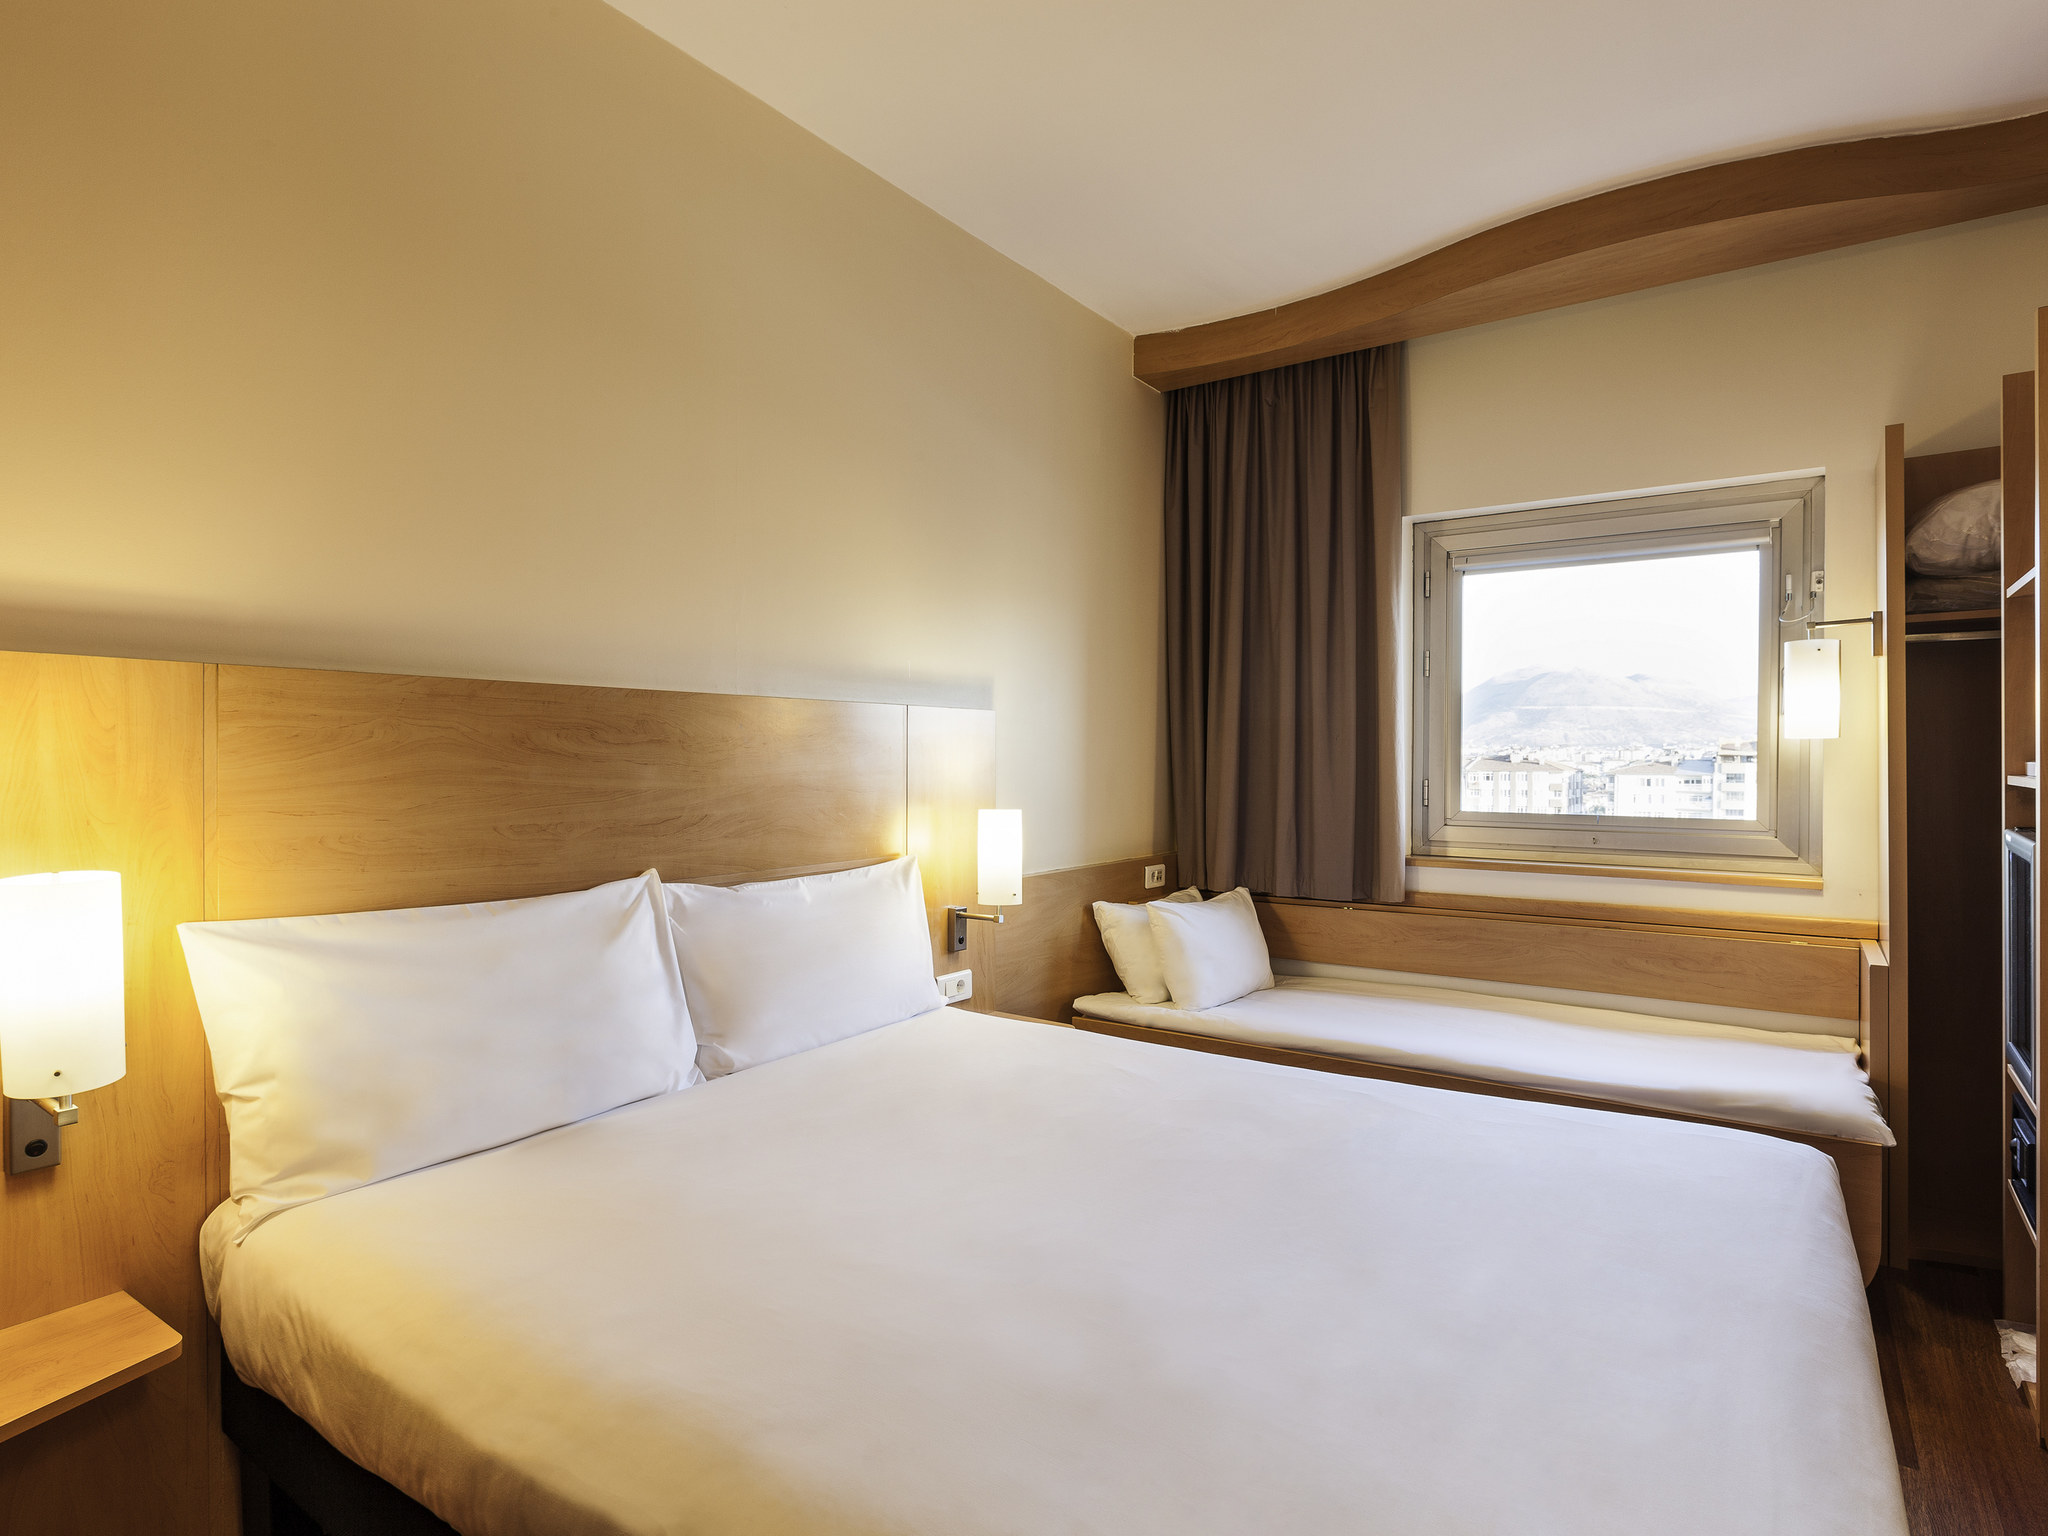 wonderful code postal roissy charles de gaulle 9 hotel ibis roissy cdg paris nord 2. Black Bedroom Furniture Sets. Home Design Ideas